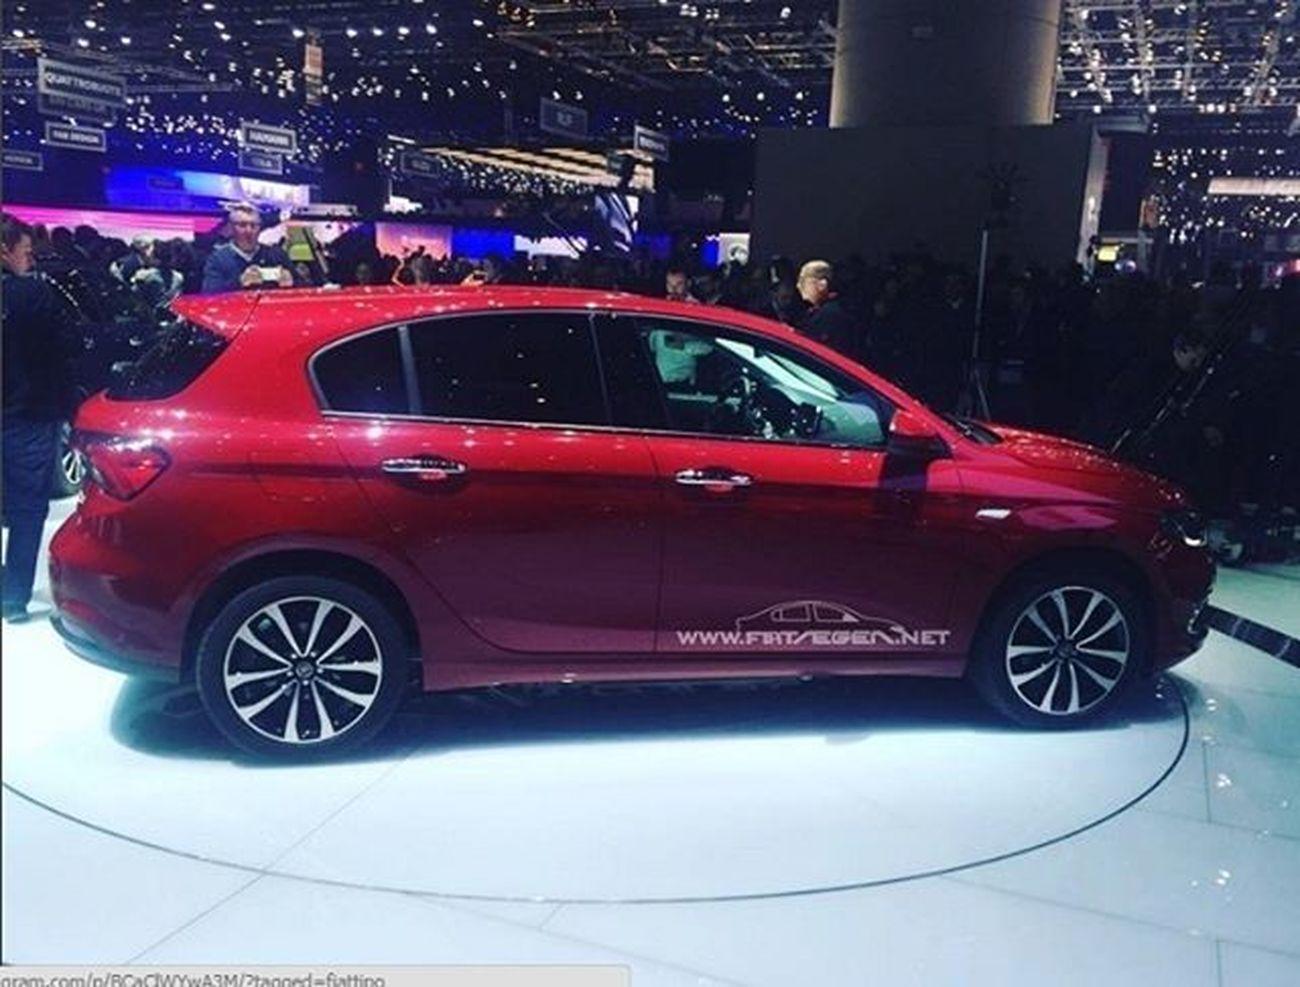 Fiategeahb cenevre otomobil fuarında tanıtıldı. Fiategeahatchback Fiattipohb Fiattipohatchback Fiategea FiatTipo